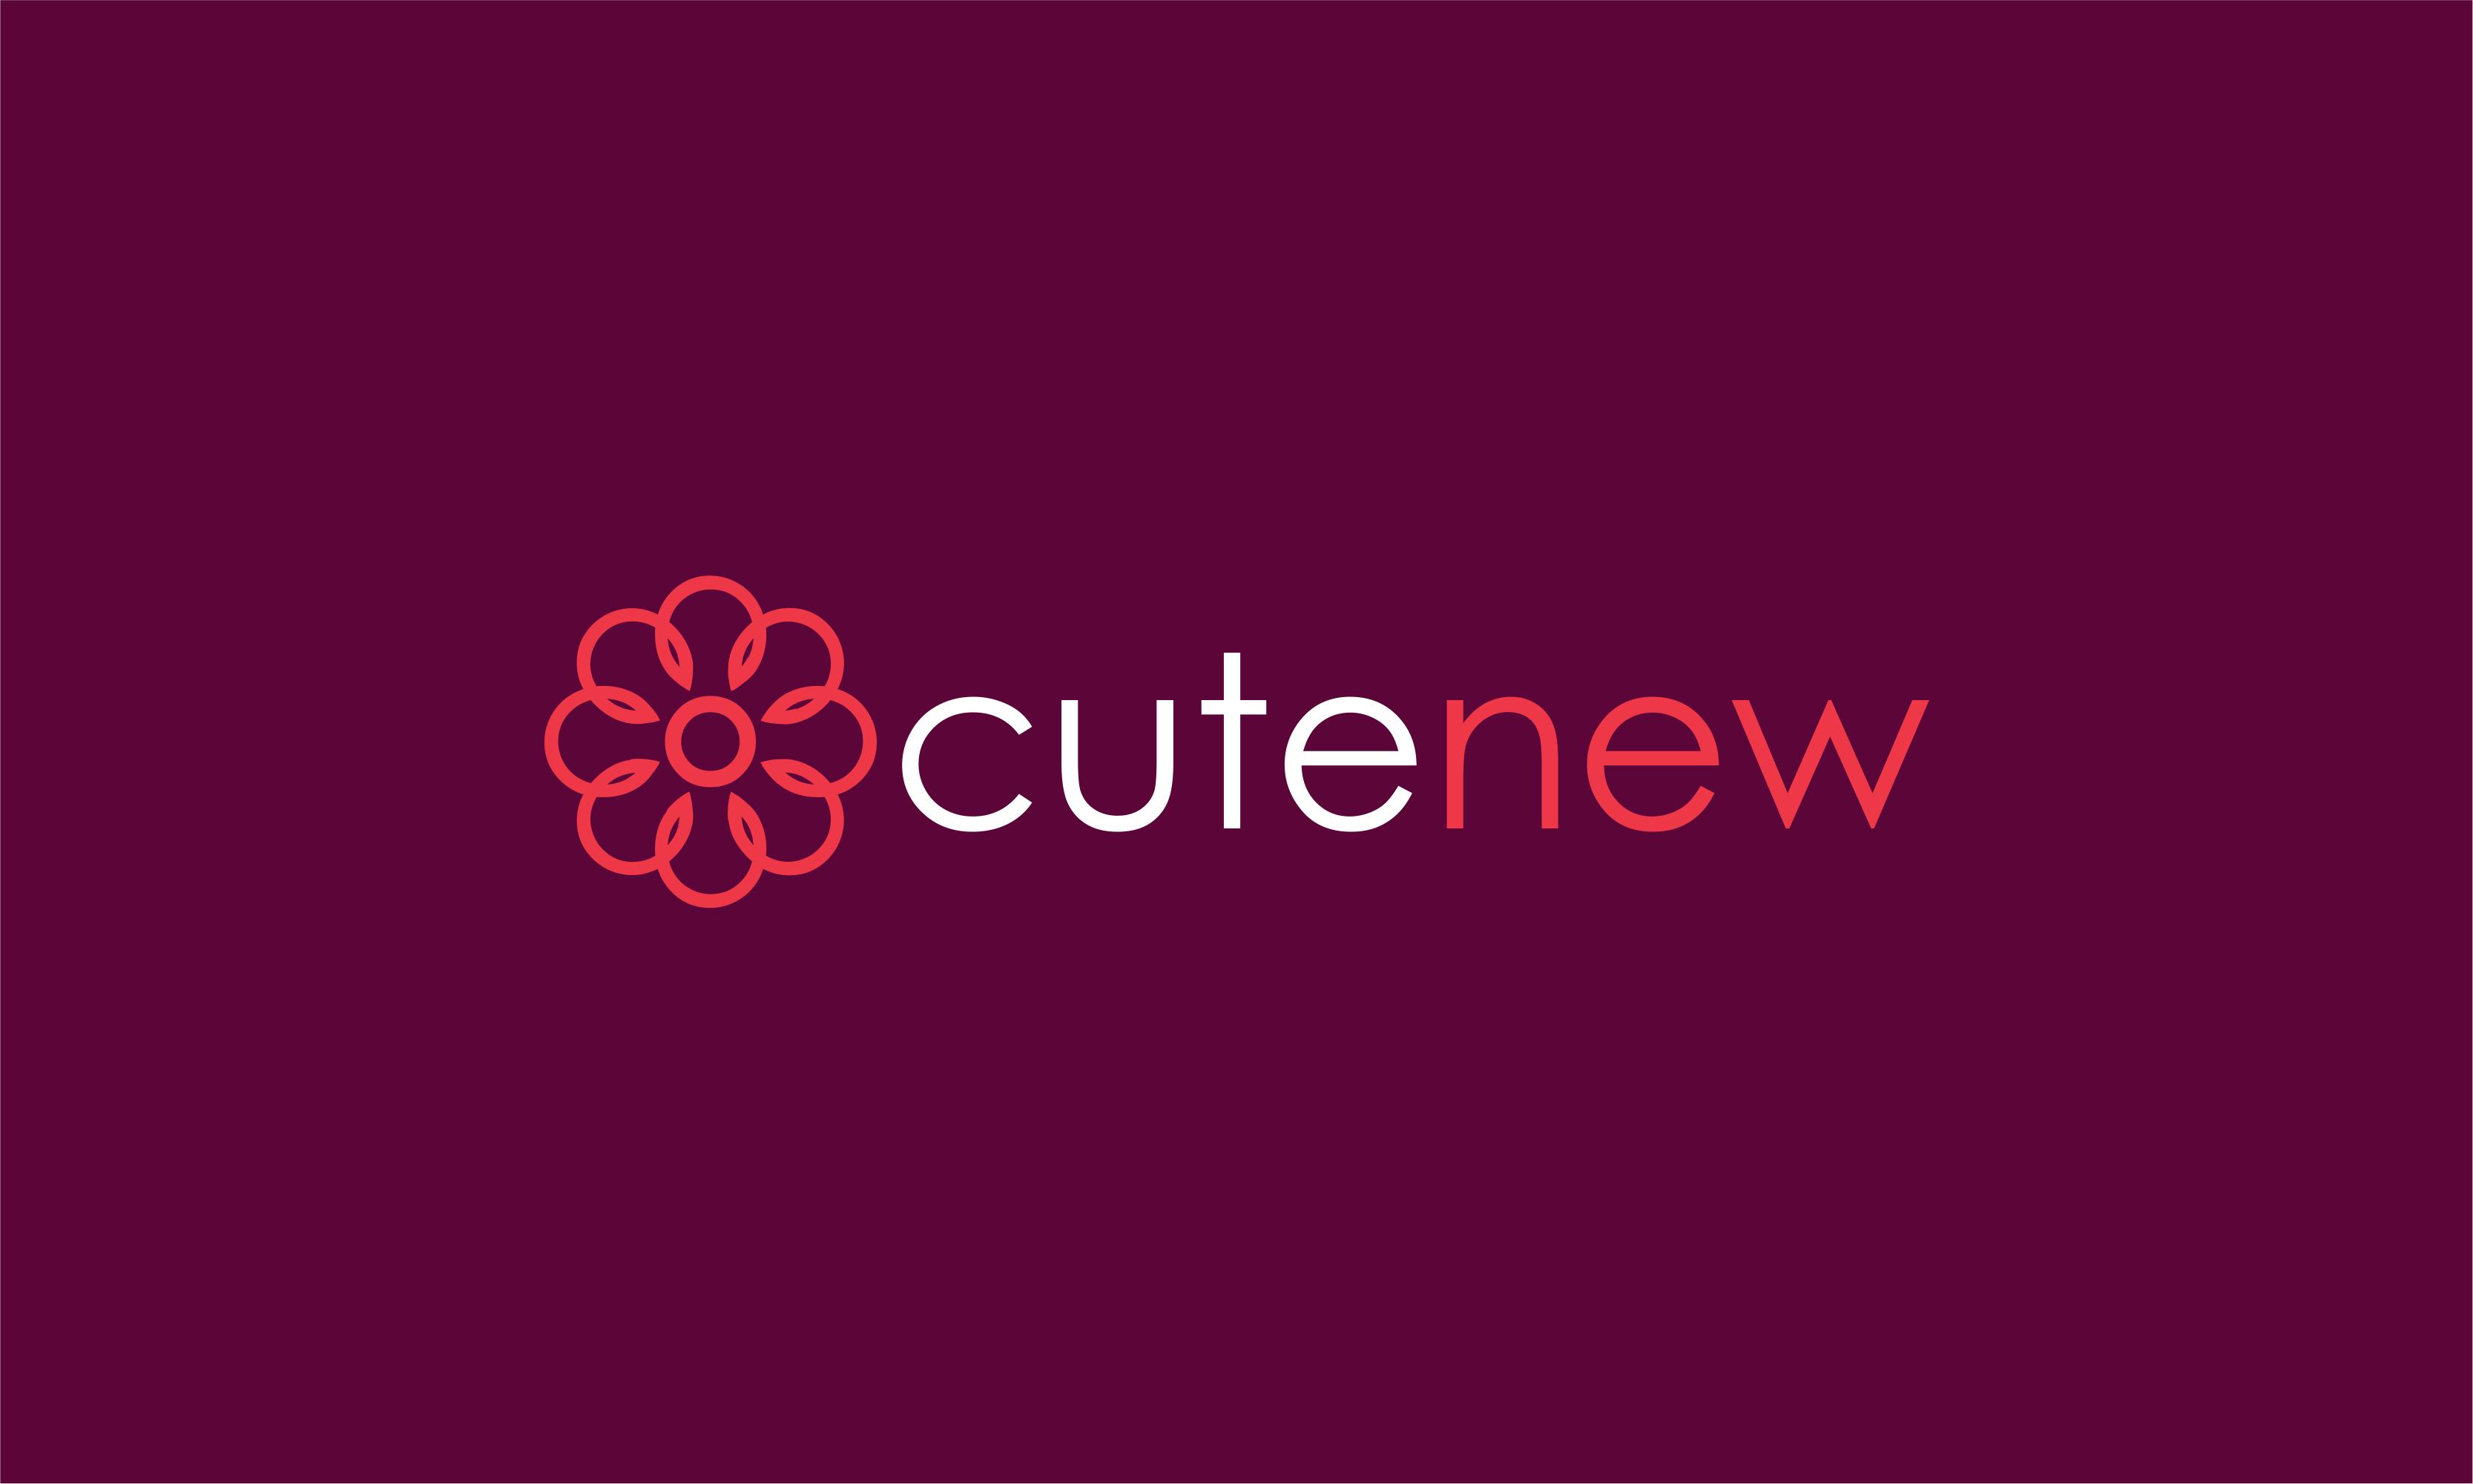 Cutenew